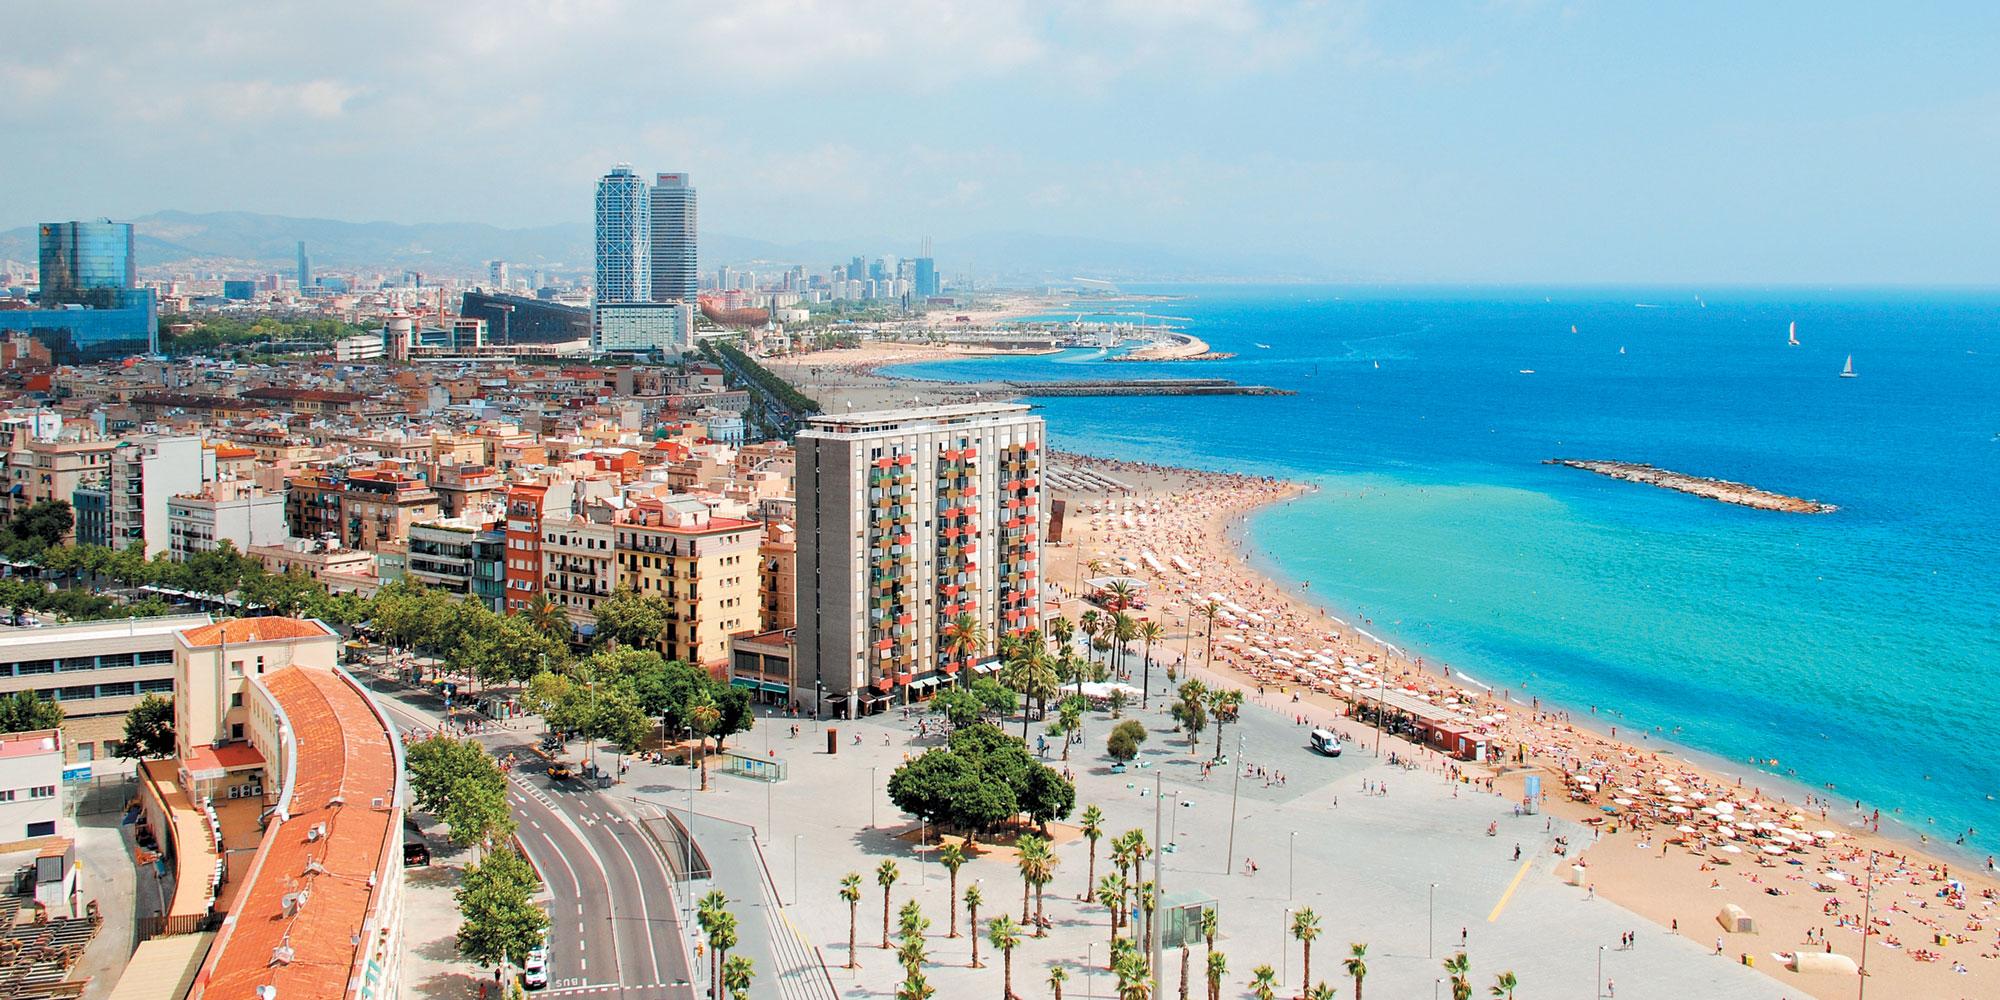 Барселона пляж обои на рабочий стол